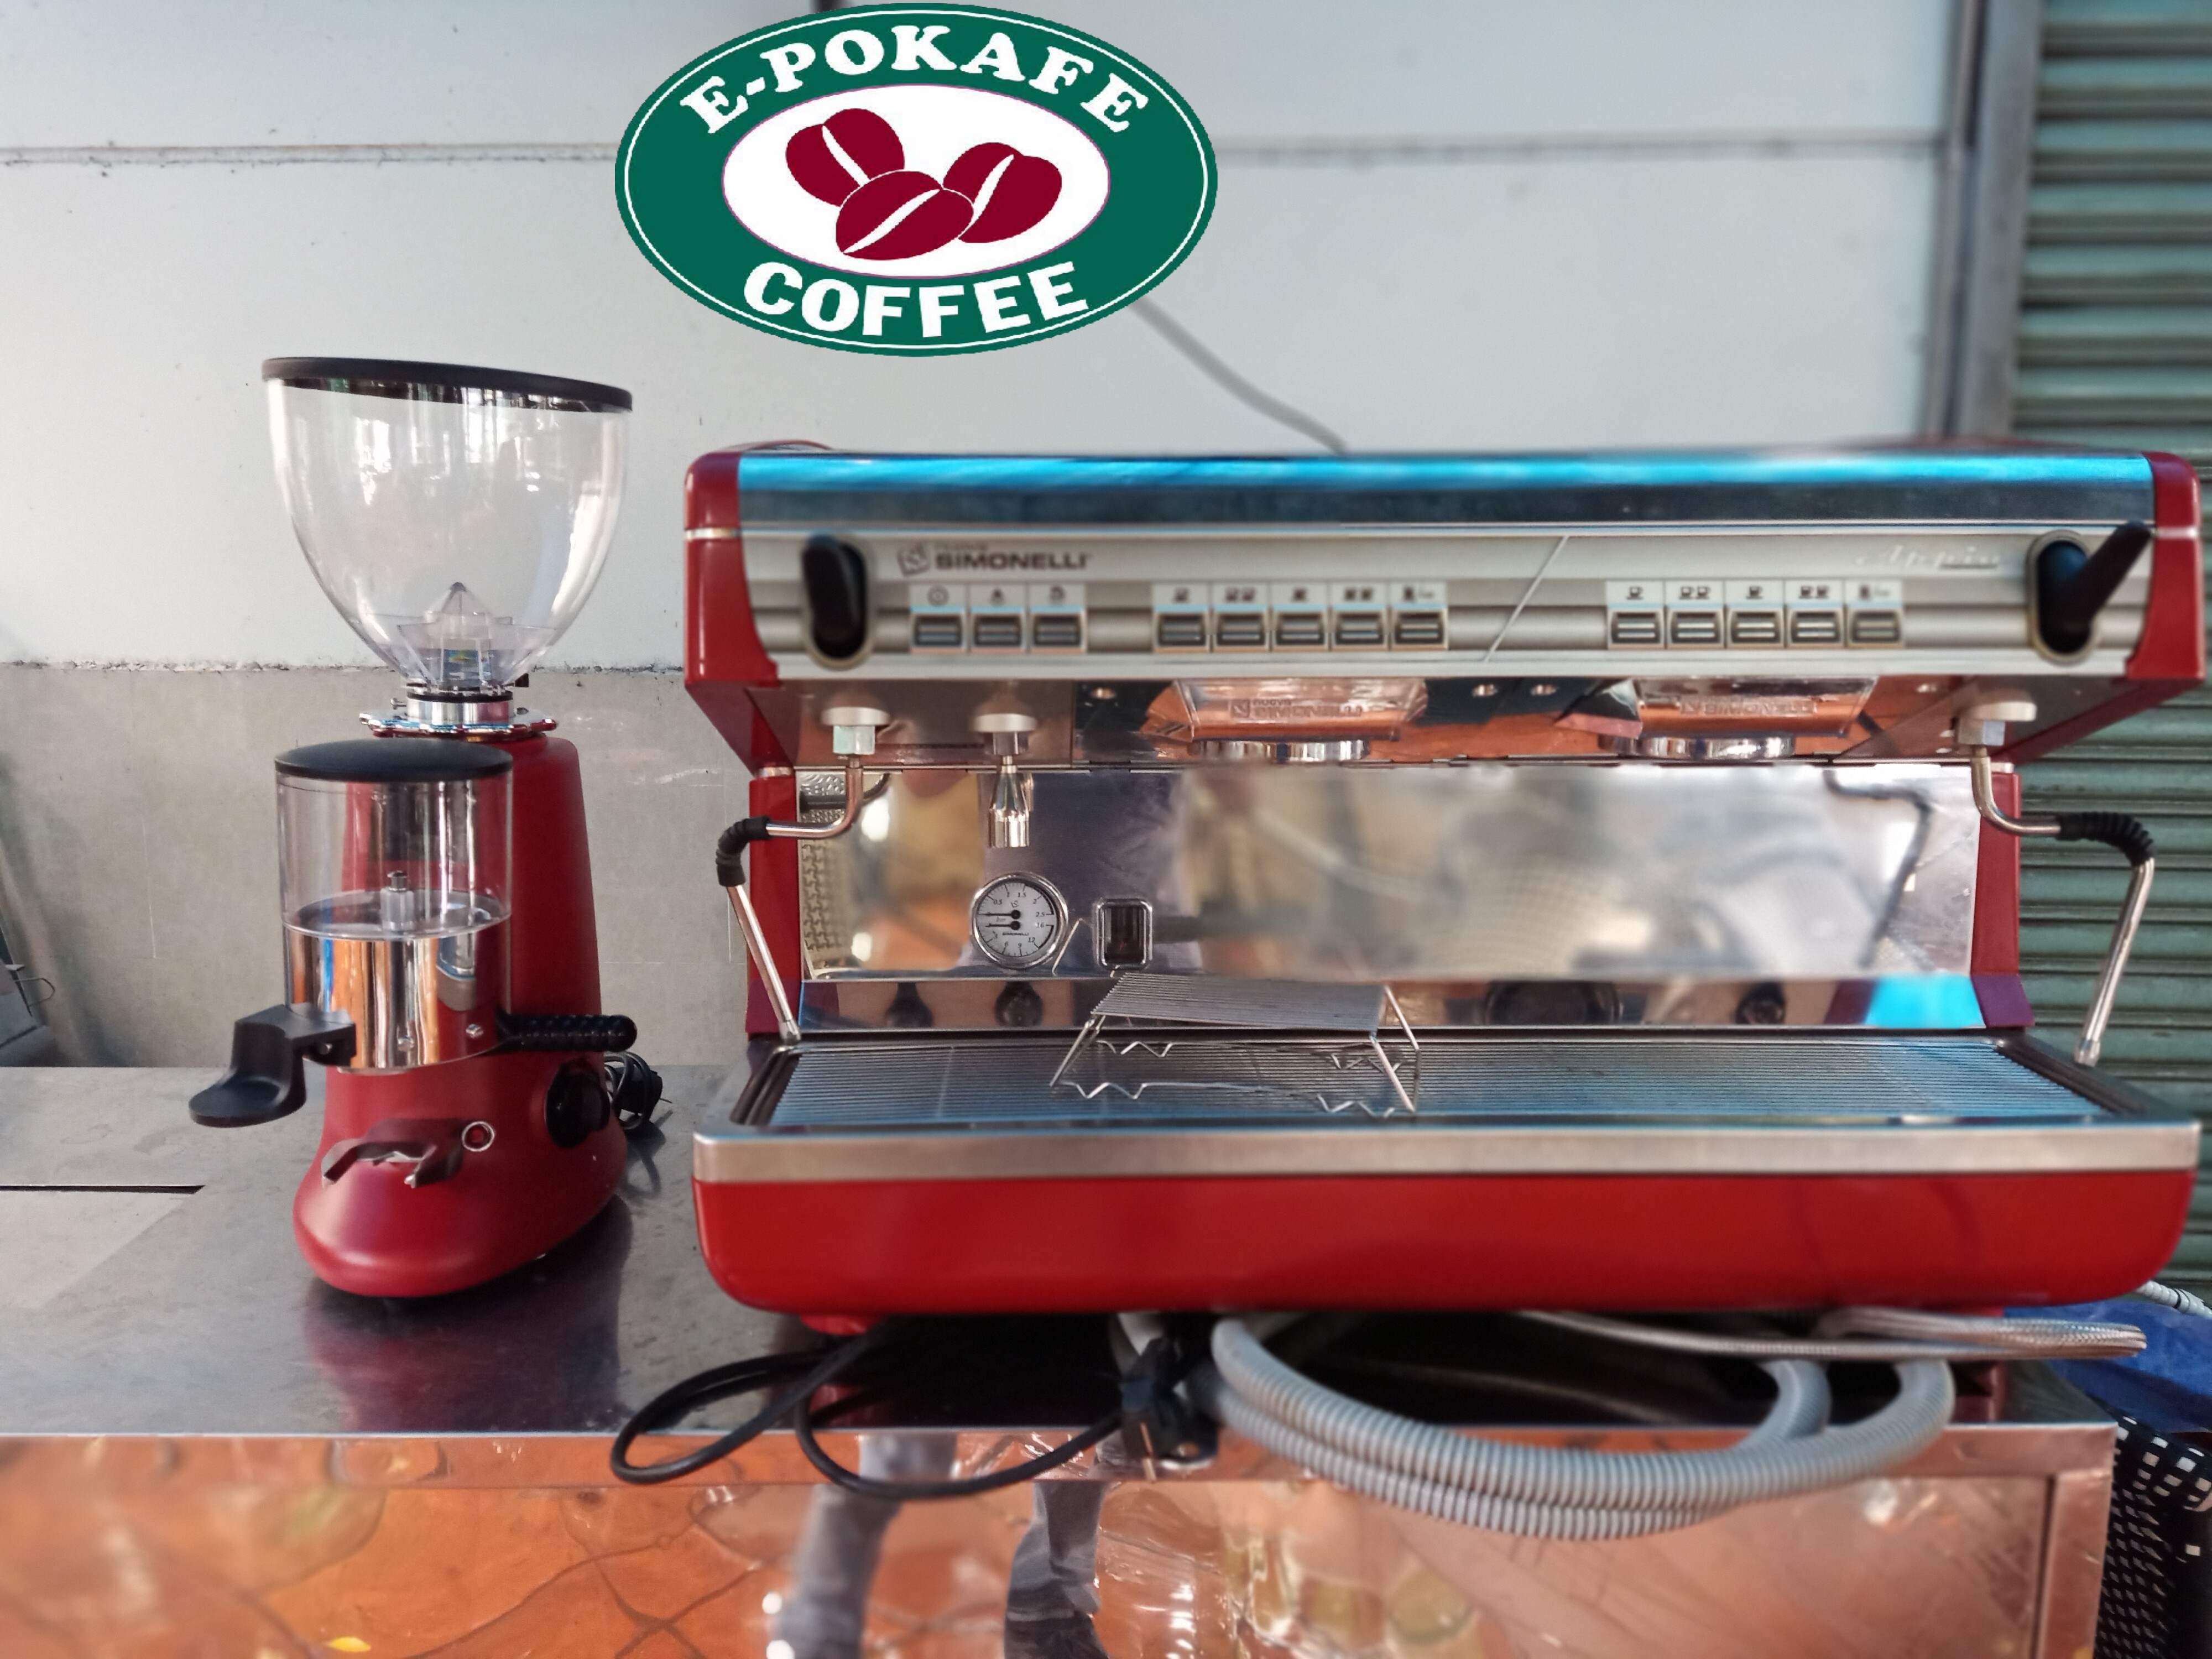 máy pha Gemilai CMR3200B, máy pha Casadio undici, máy pha Nuova Simonelli, Máy pha Carimali, Máy pha Expobar, máy pha cafe Feama, máy pha cafe mang đi